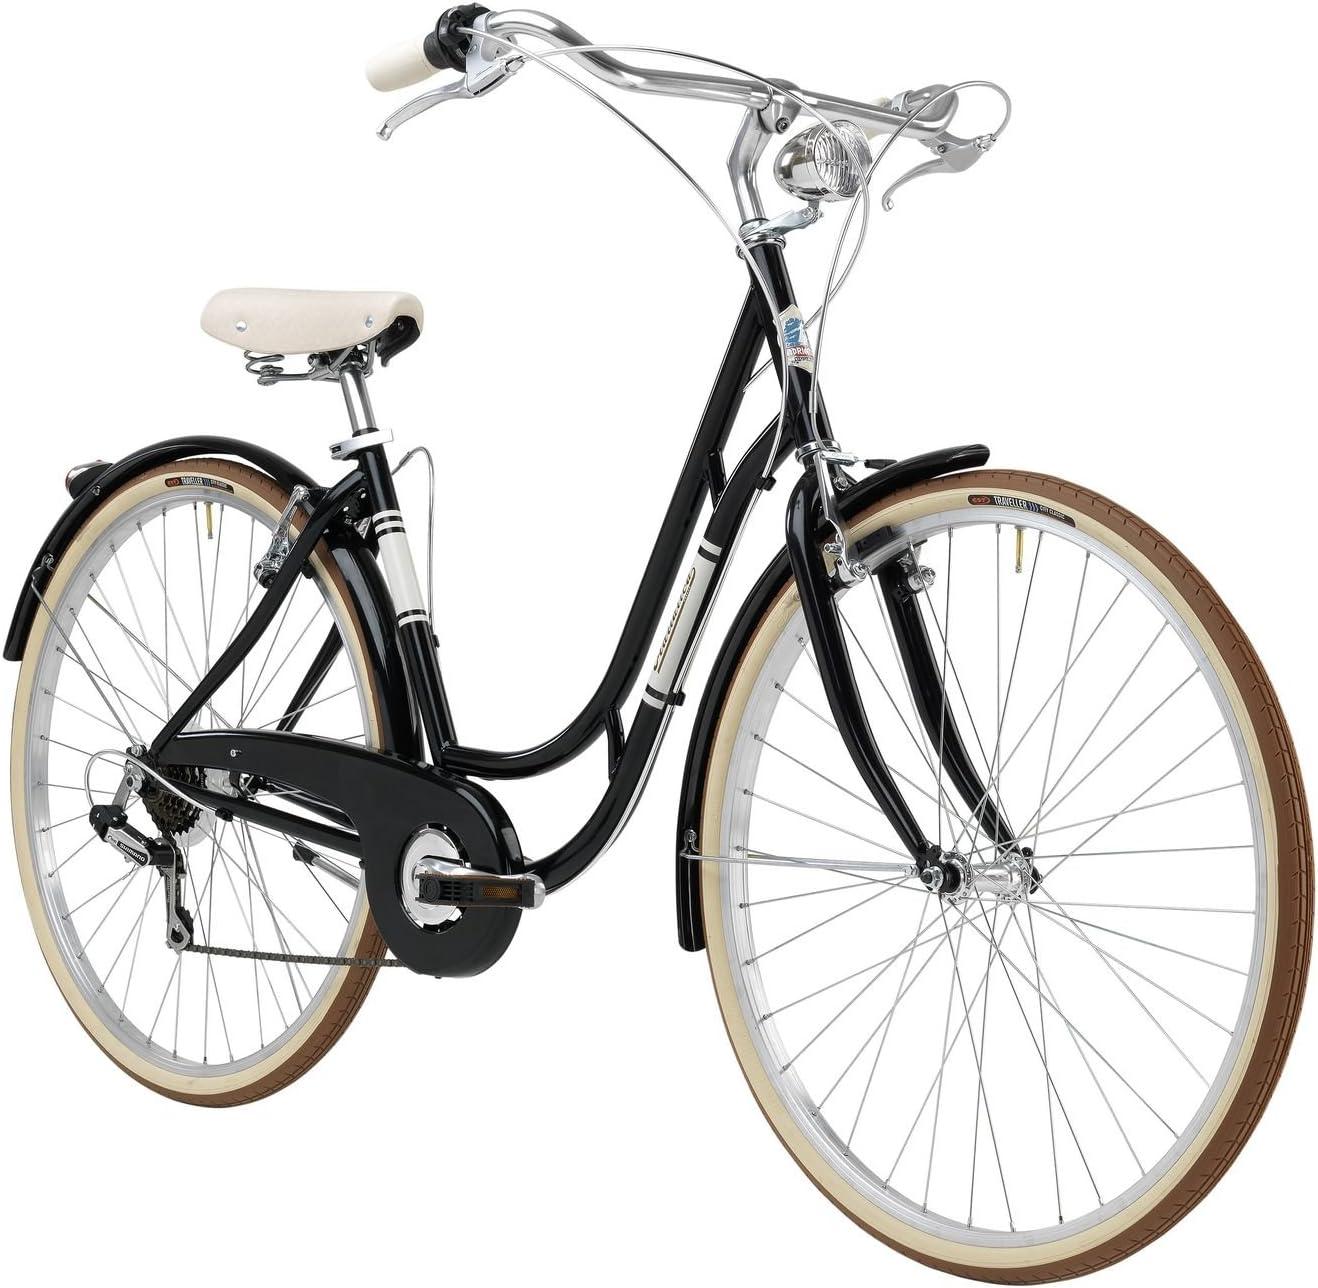 Bicicleta Clasica Retro Vintage Mujer Adriatica Danish 48cm 6v ...